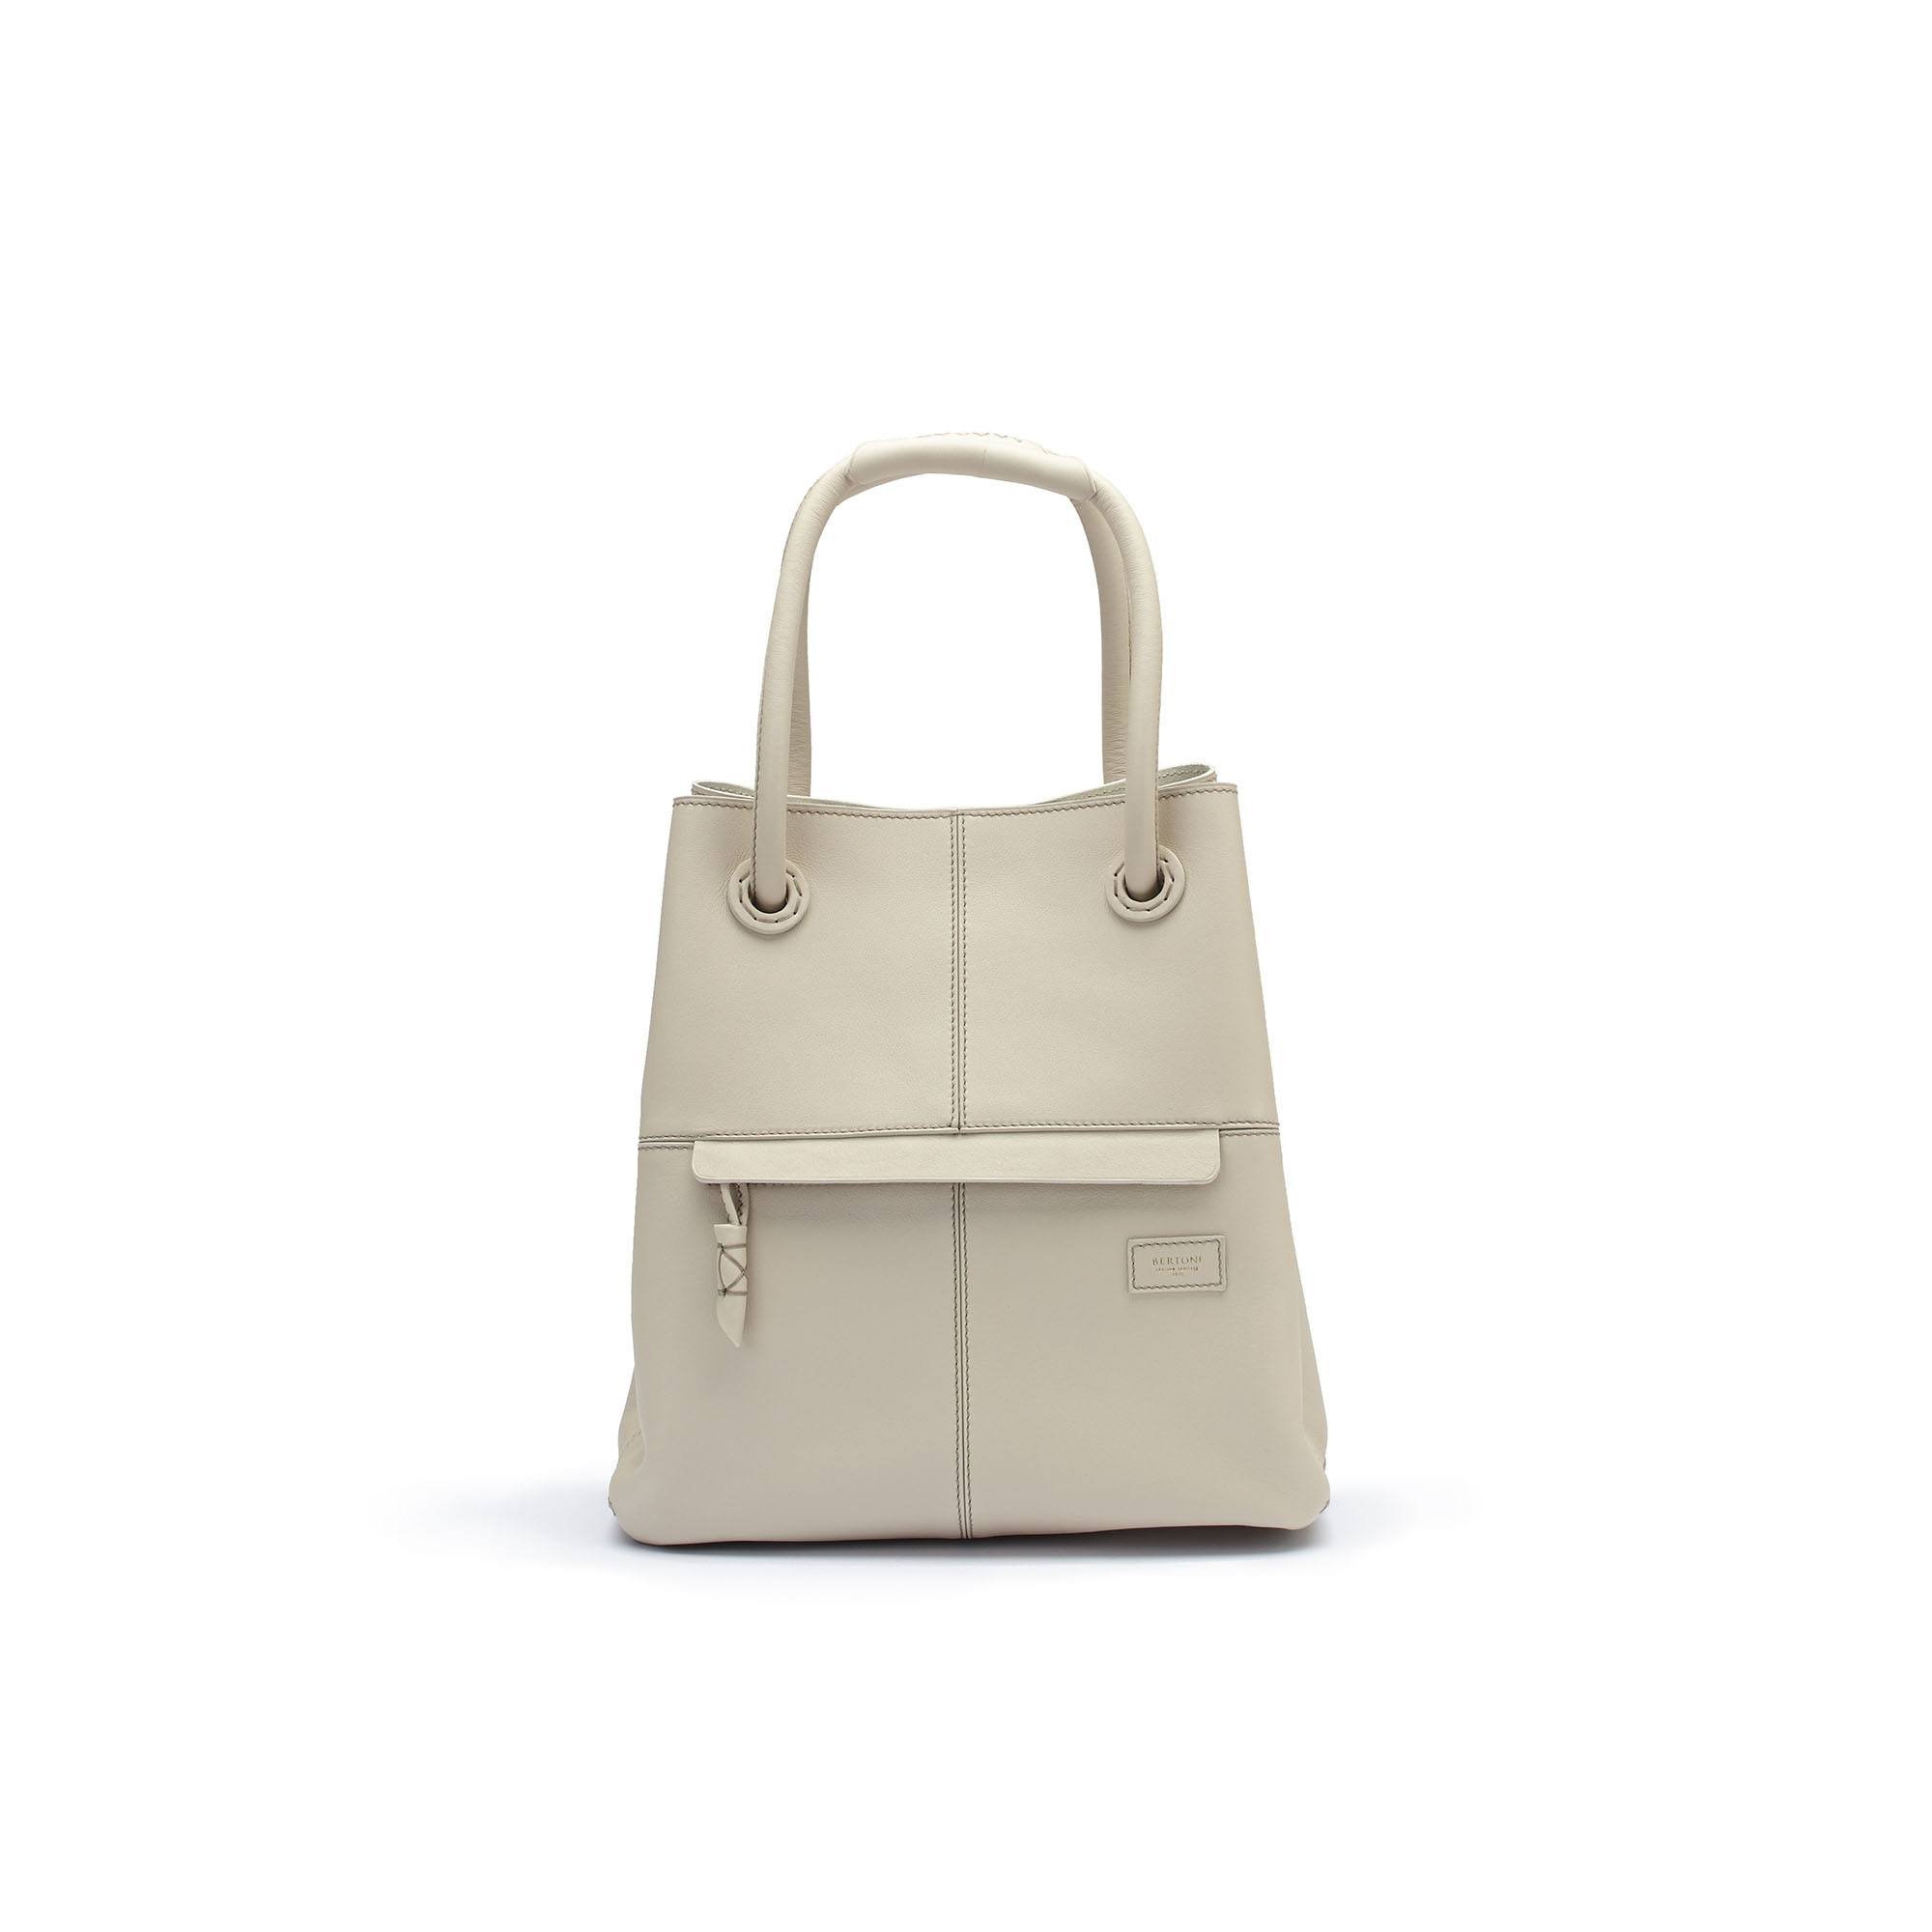 The Ivory soft calf Satchel bag by Bertoni 1949 01